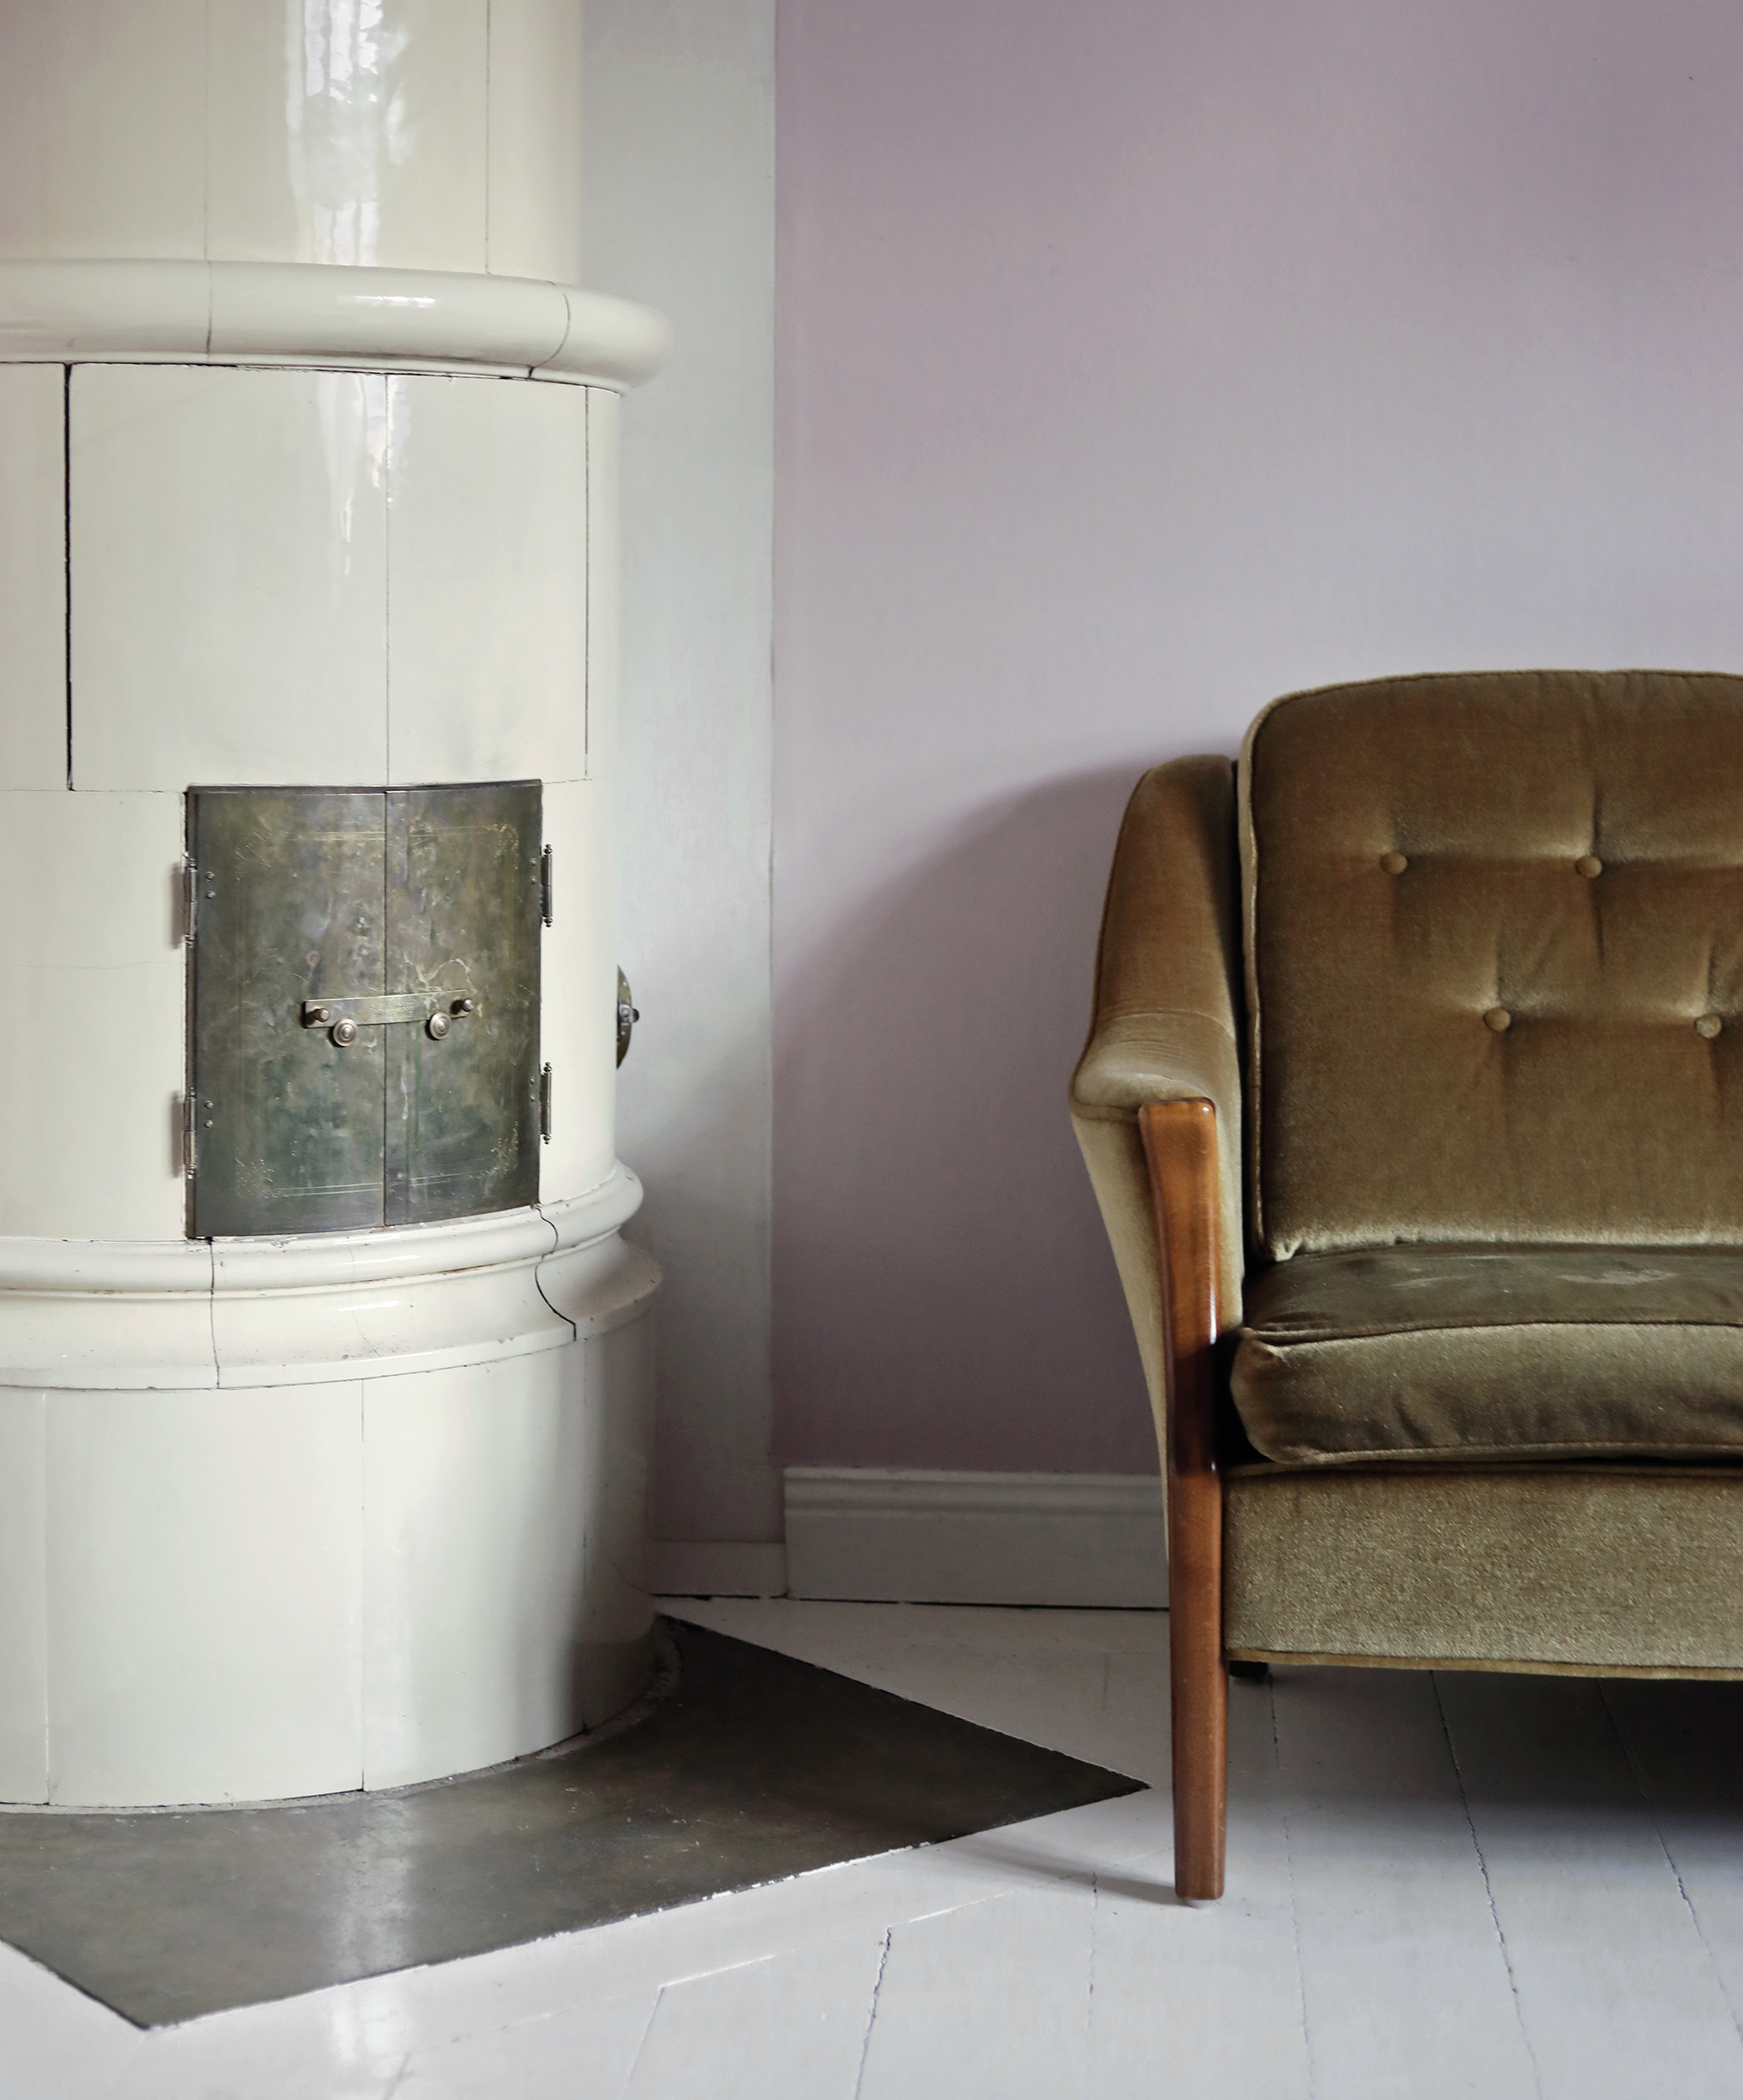 soffa vardagsrum vintage blocket retro